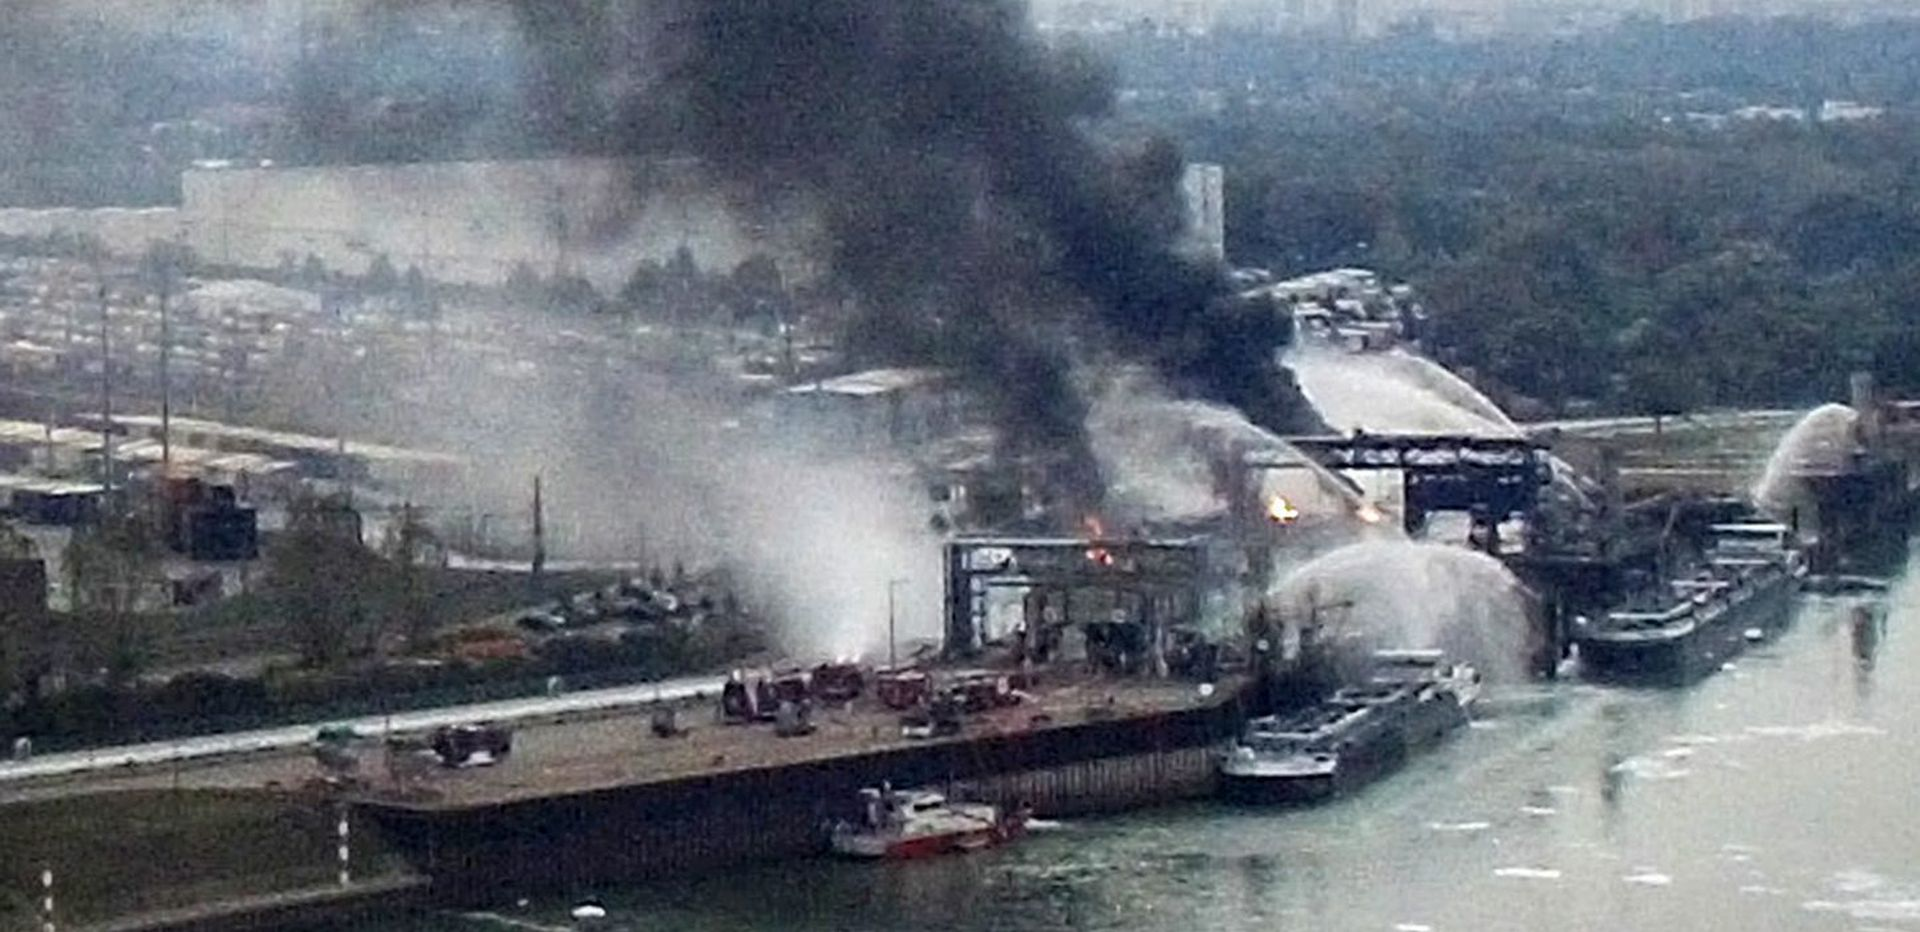 NJEMAČKA Potvrđen prvi smrtni slučaj u eksploziji tvornice BASF